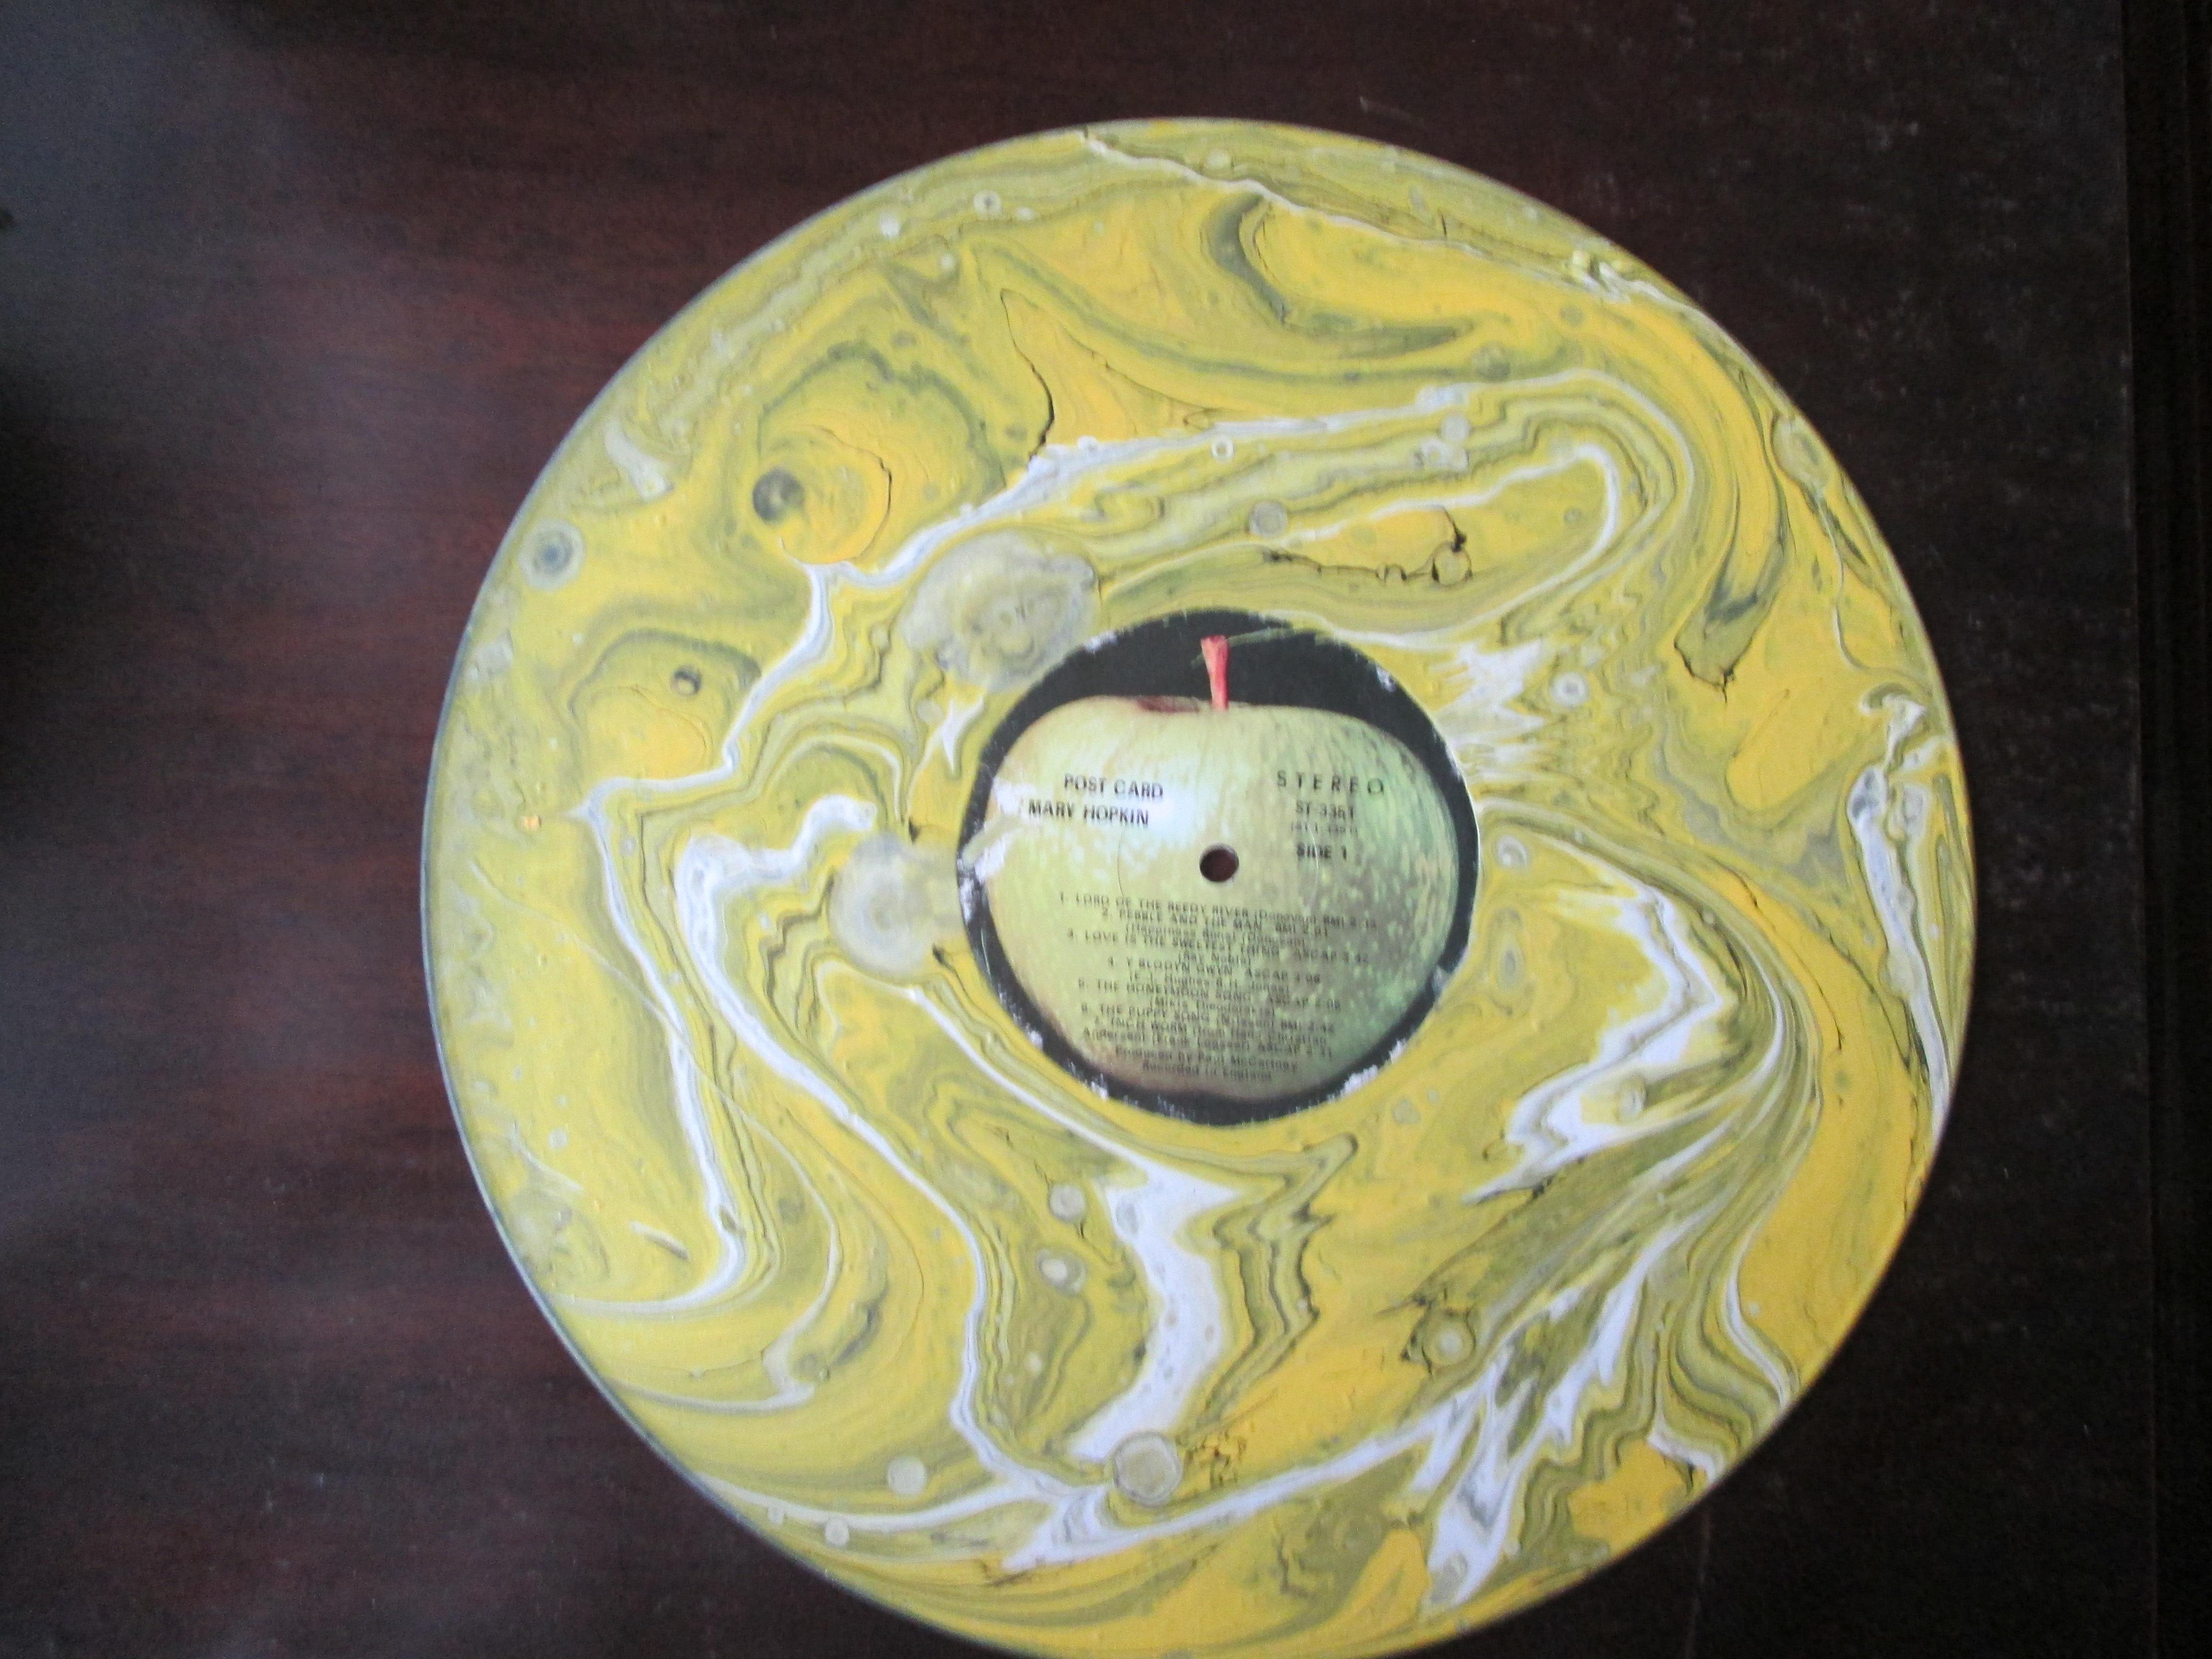 Upcycled Vinyl Record